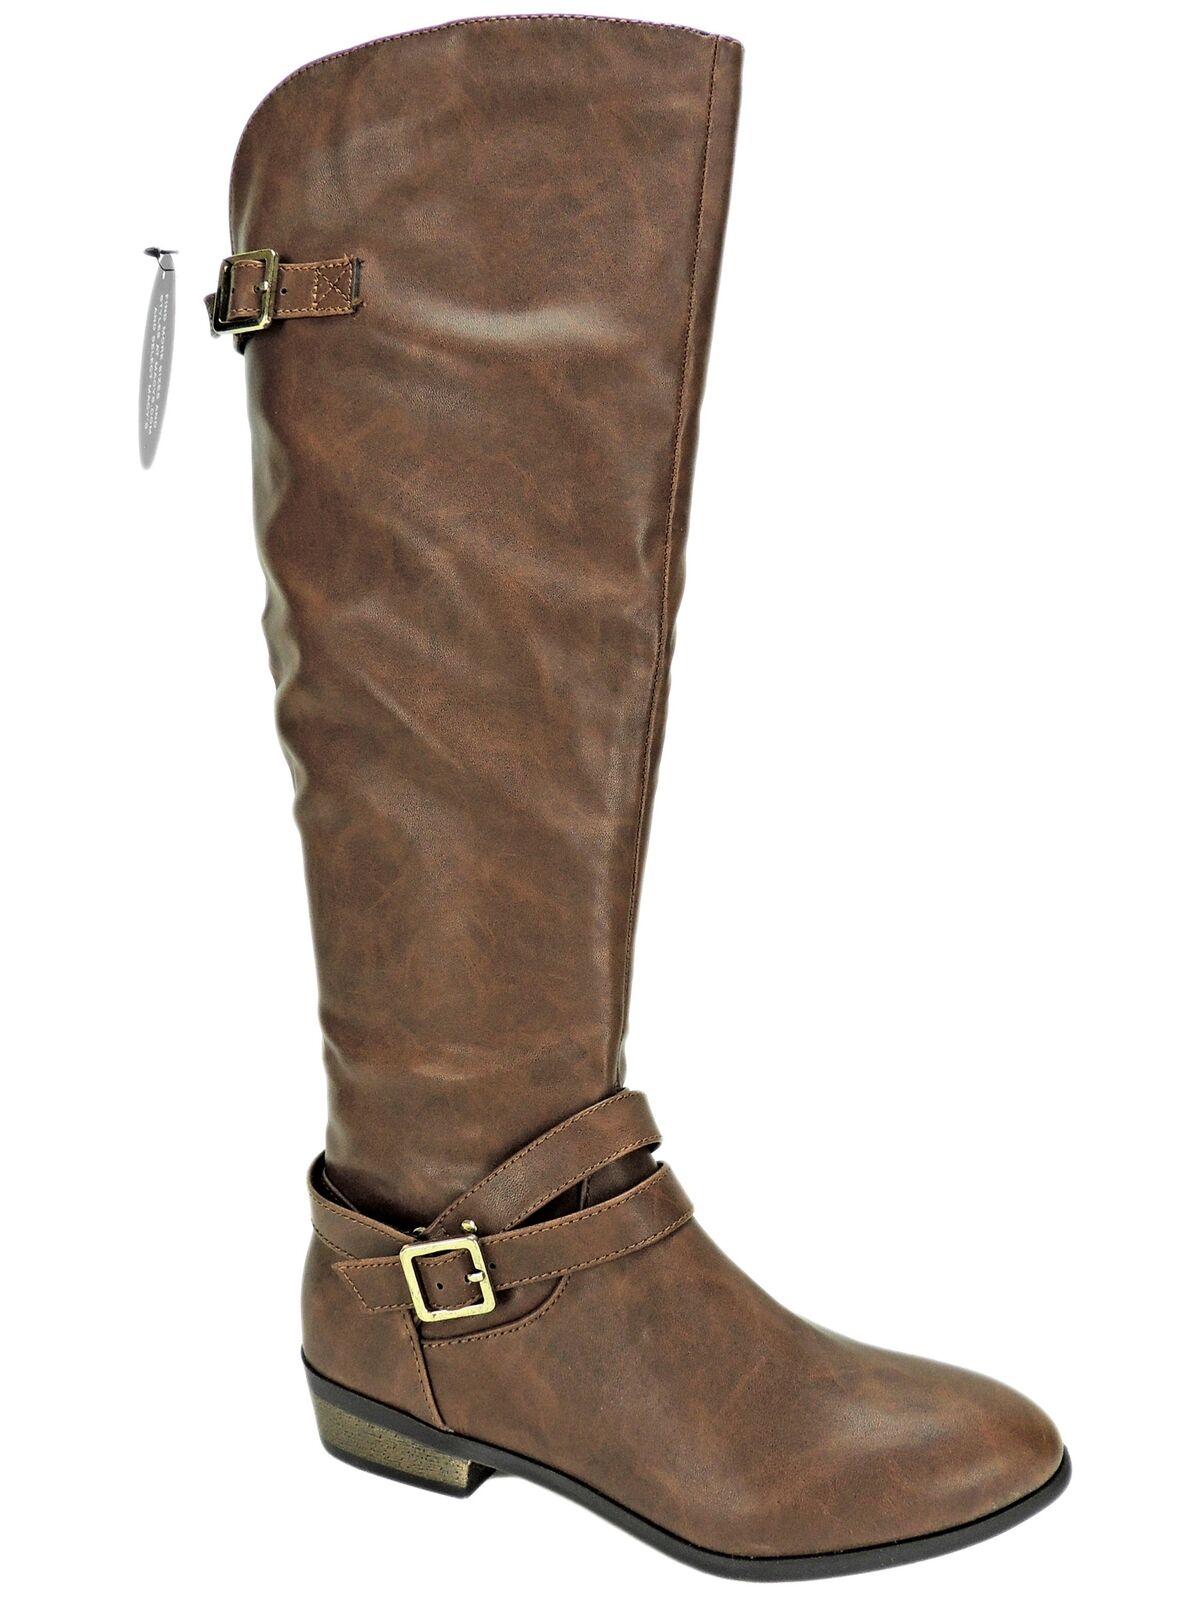 Material Girl Women's Capri Knee-High Riding Boots Cognac Size 6 M